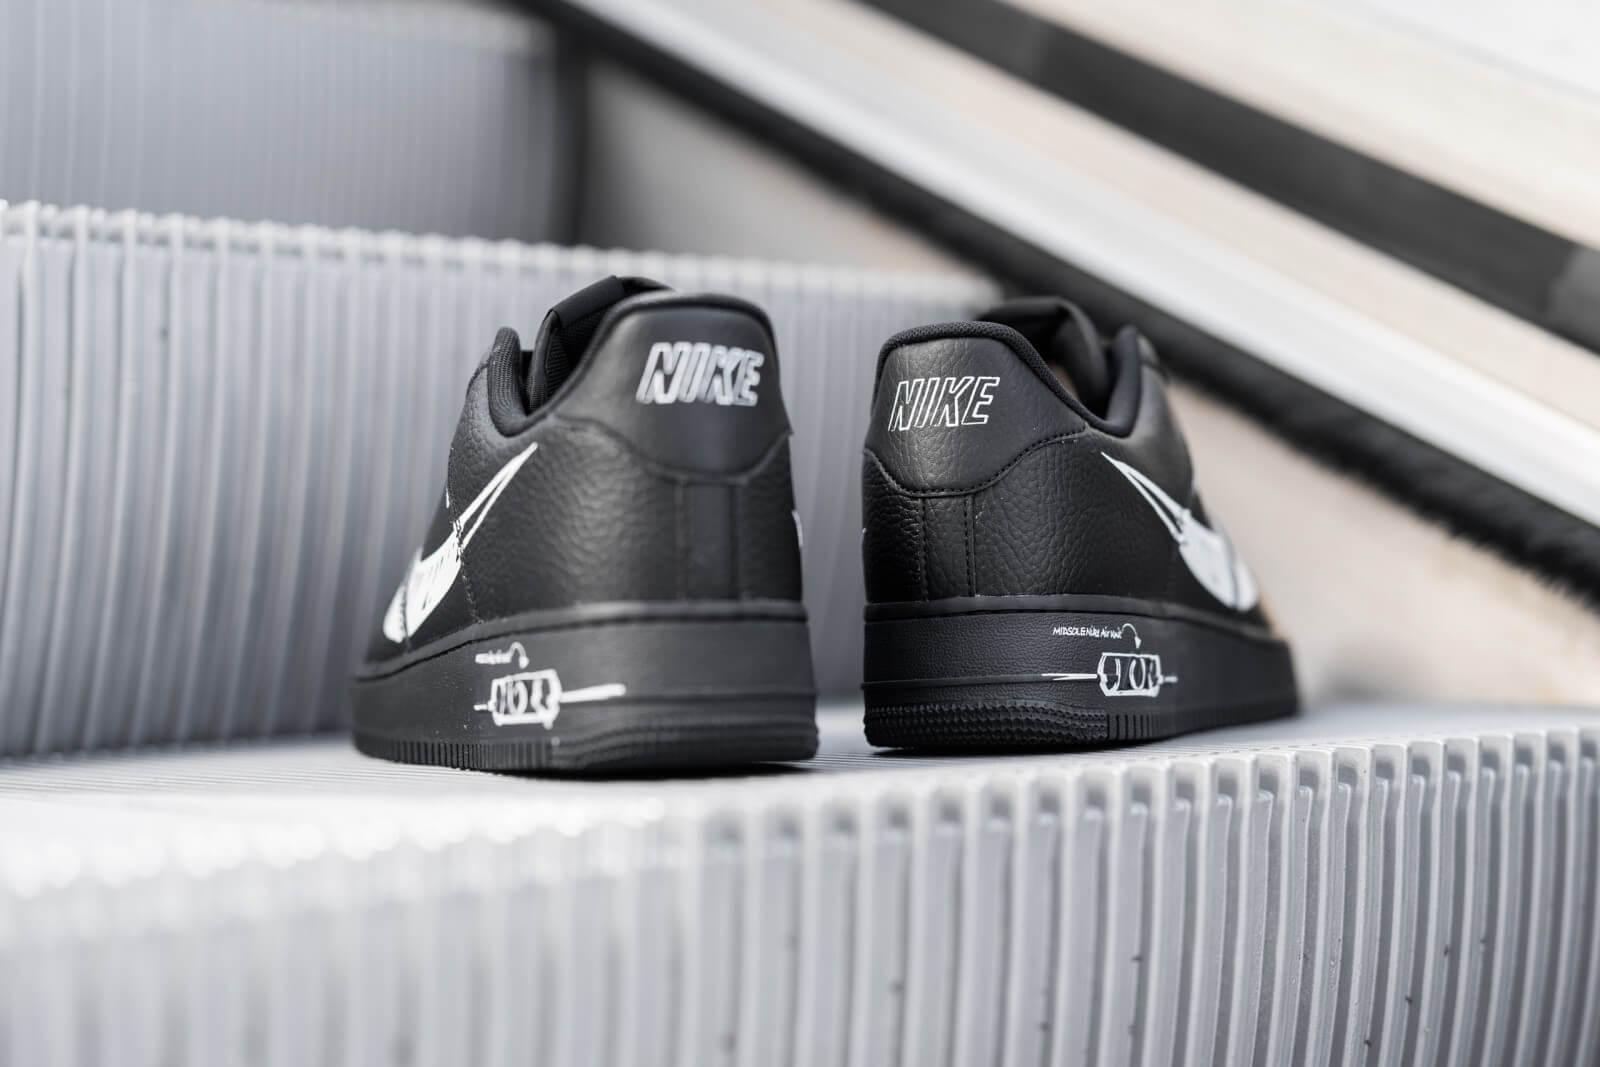 Nike Air Force 1 LV8 Utility Sketch Black/White-Black